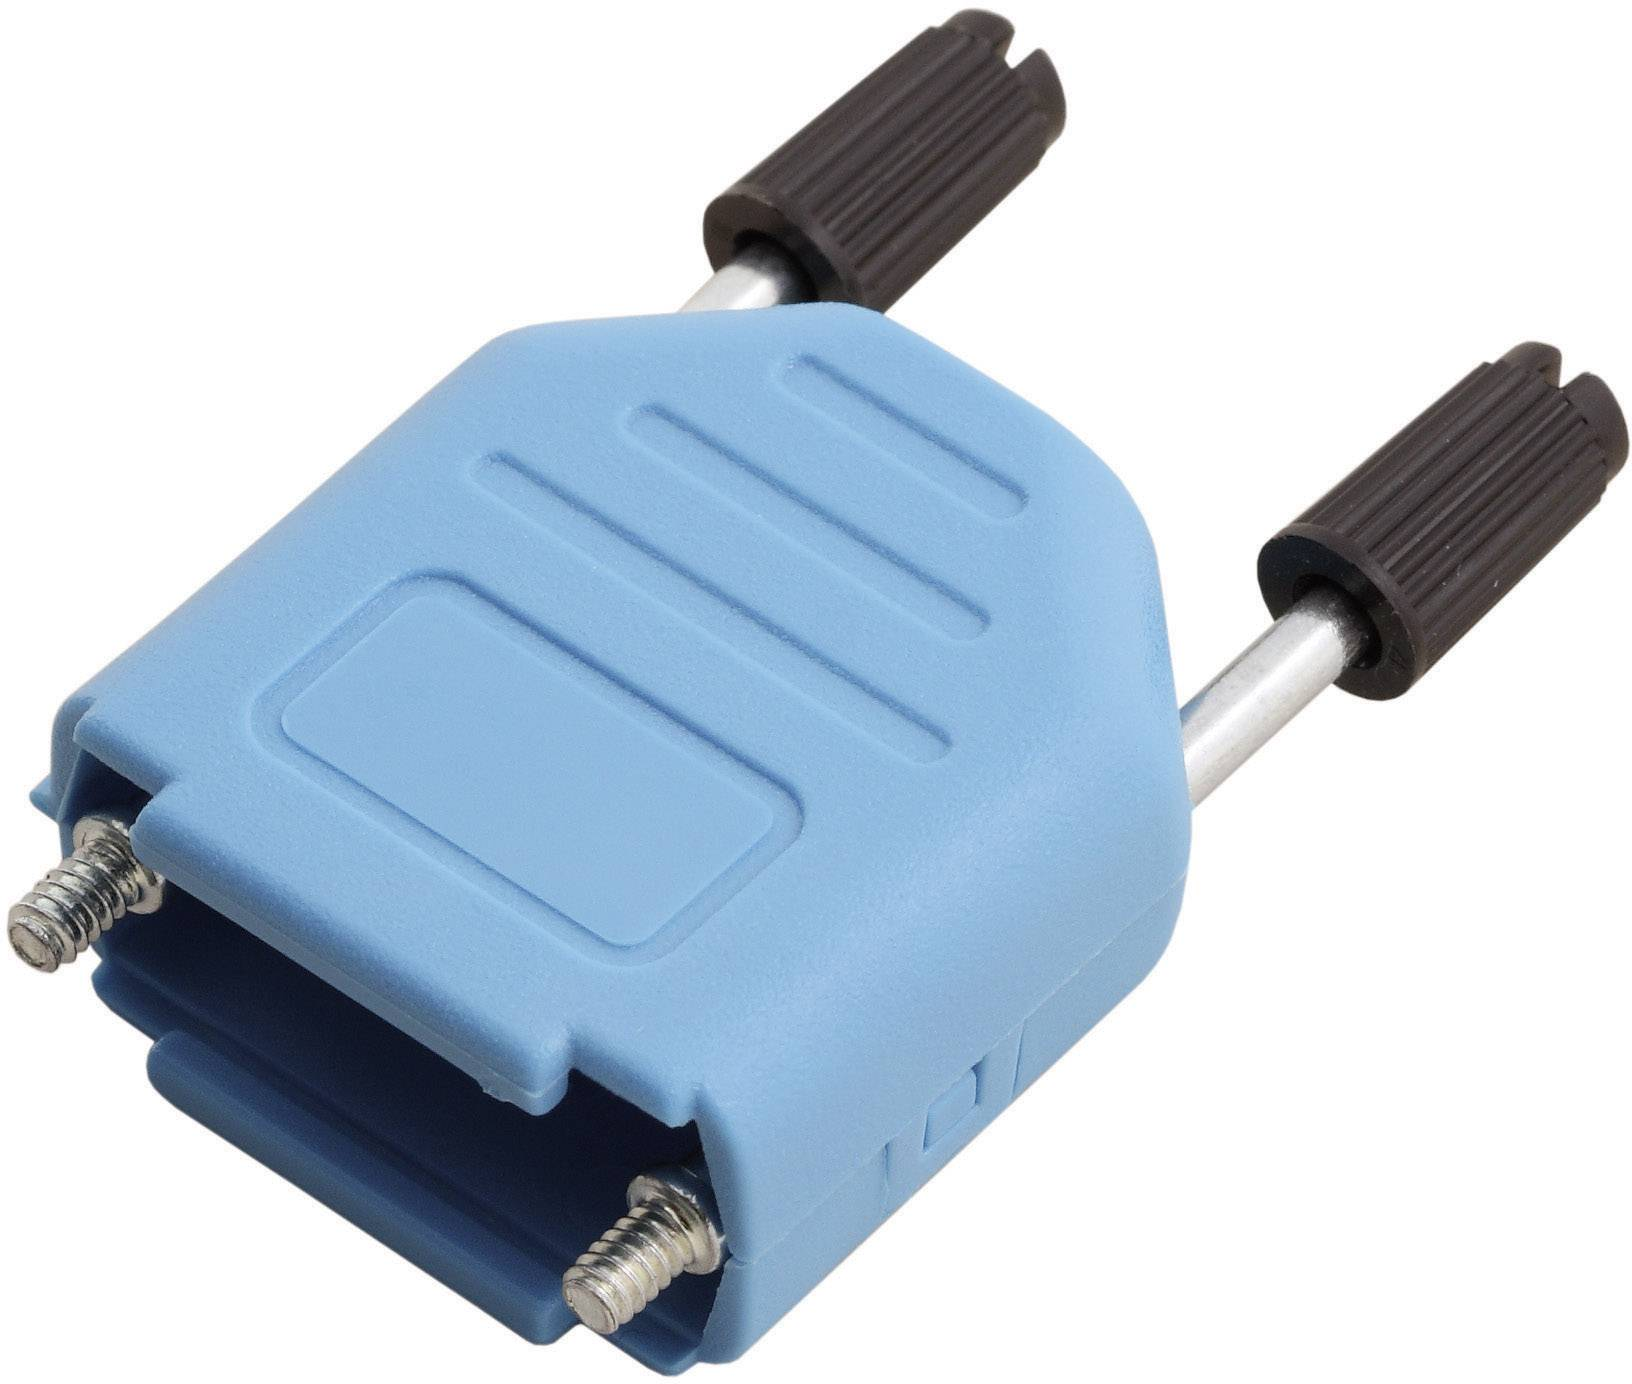 D-SUB púzdro MH Connectors MHDPPK09-B-K 6353-0104-01, počet pinov: 9, plast, 180 °, modrá, 1 ks